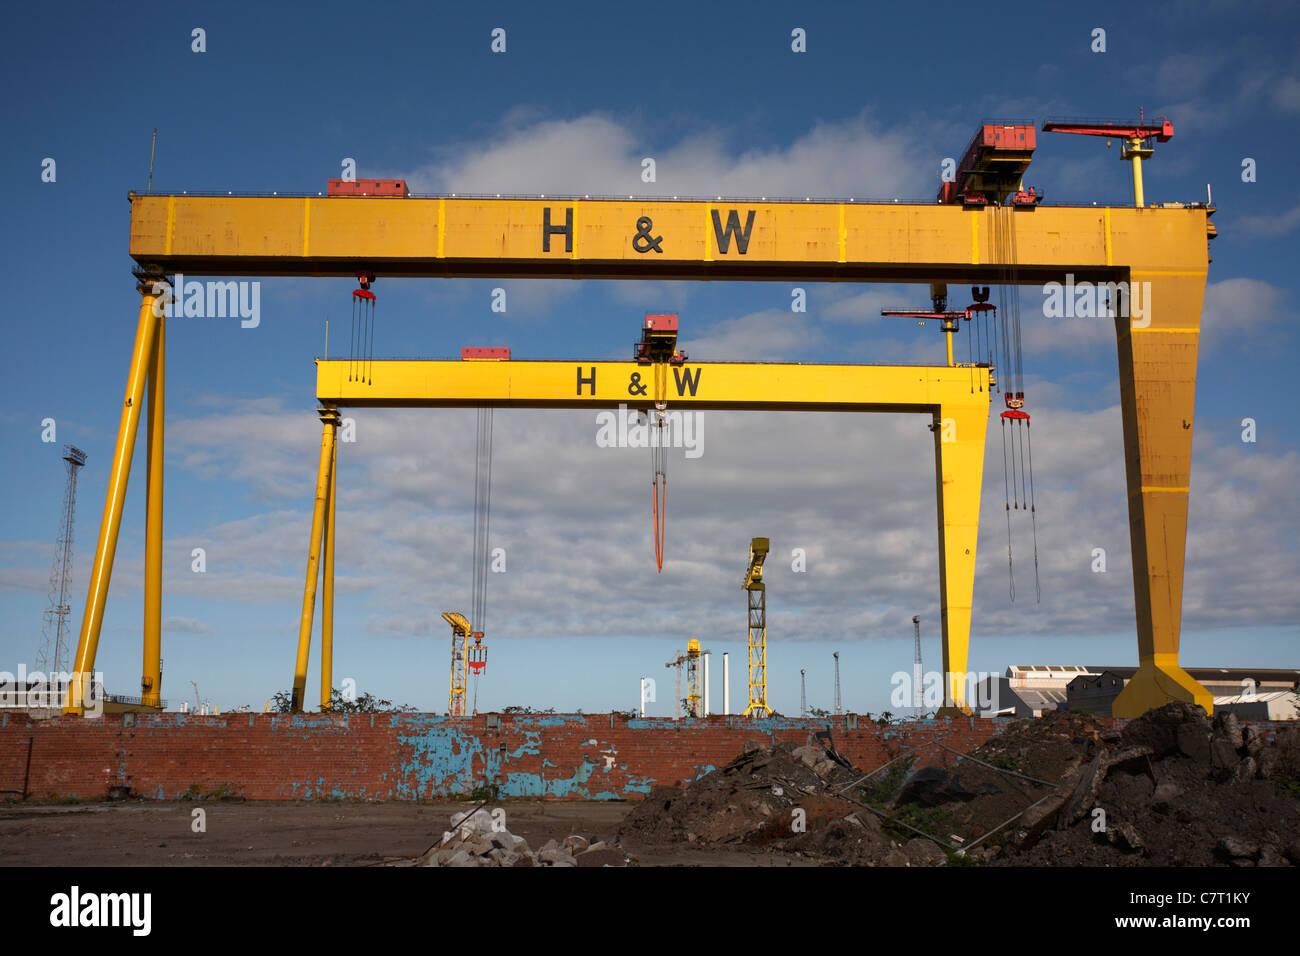 Harland and Wolff twin gantry shipyard cranes Samson and ...